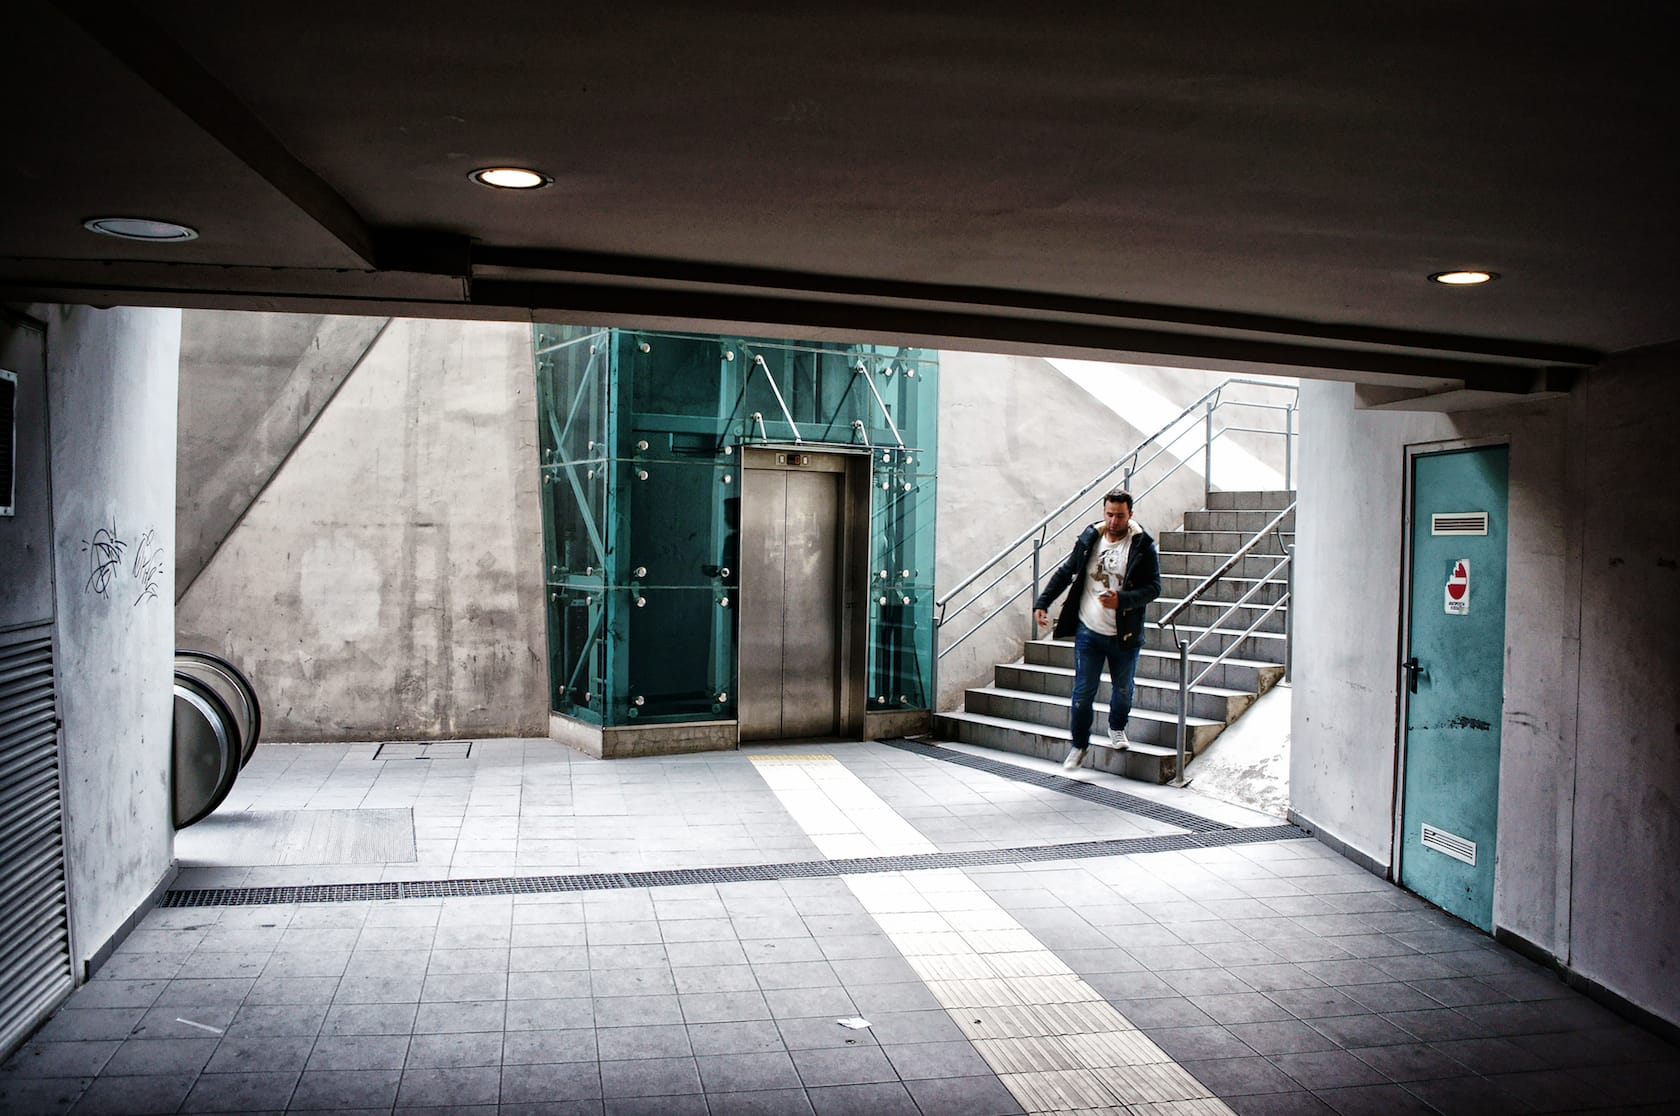 Perissos train station